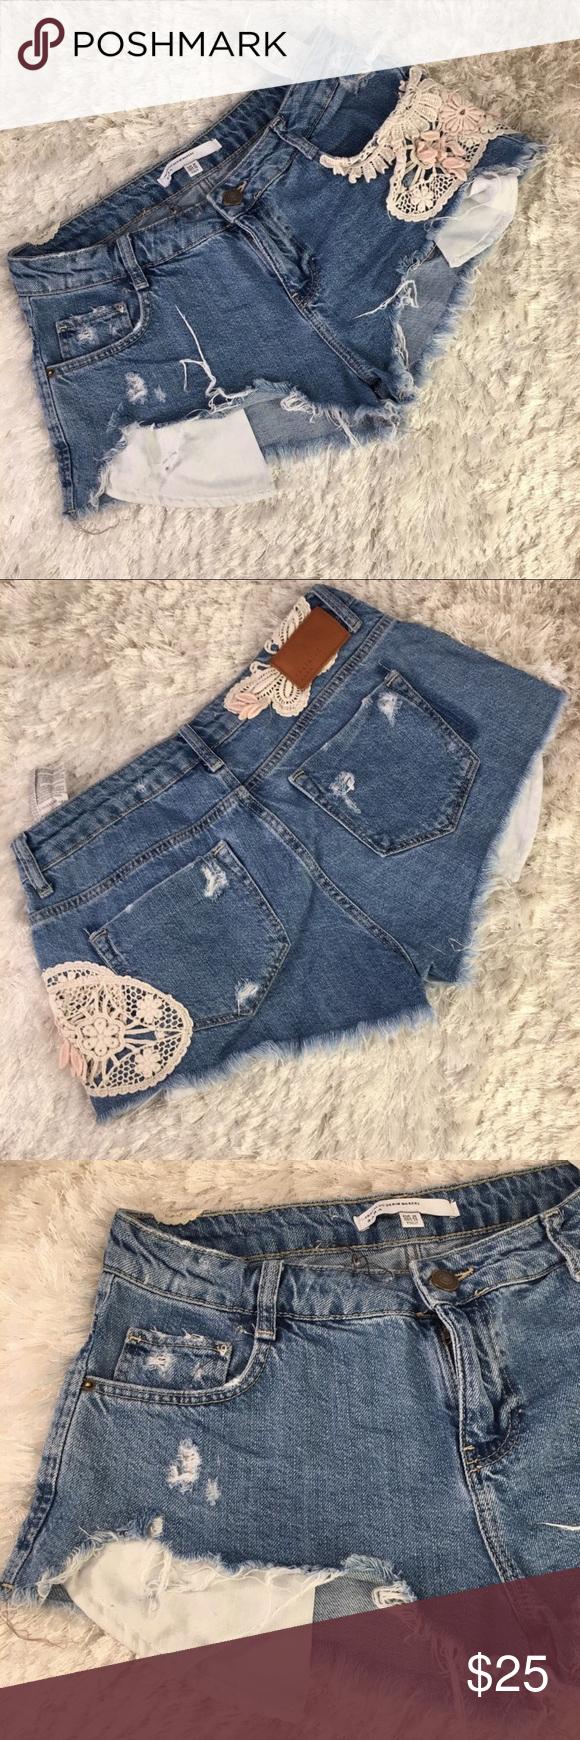 72d2834aff Zara Cutoff Distressed Jean Shorts Sz 4 Zara denim cut off shorts Appliqué  in Cream and slightly pink crochet flower frayed hem Exposed pockets  Measurements ...